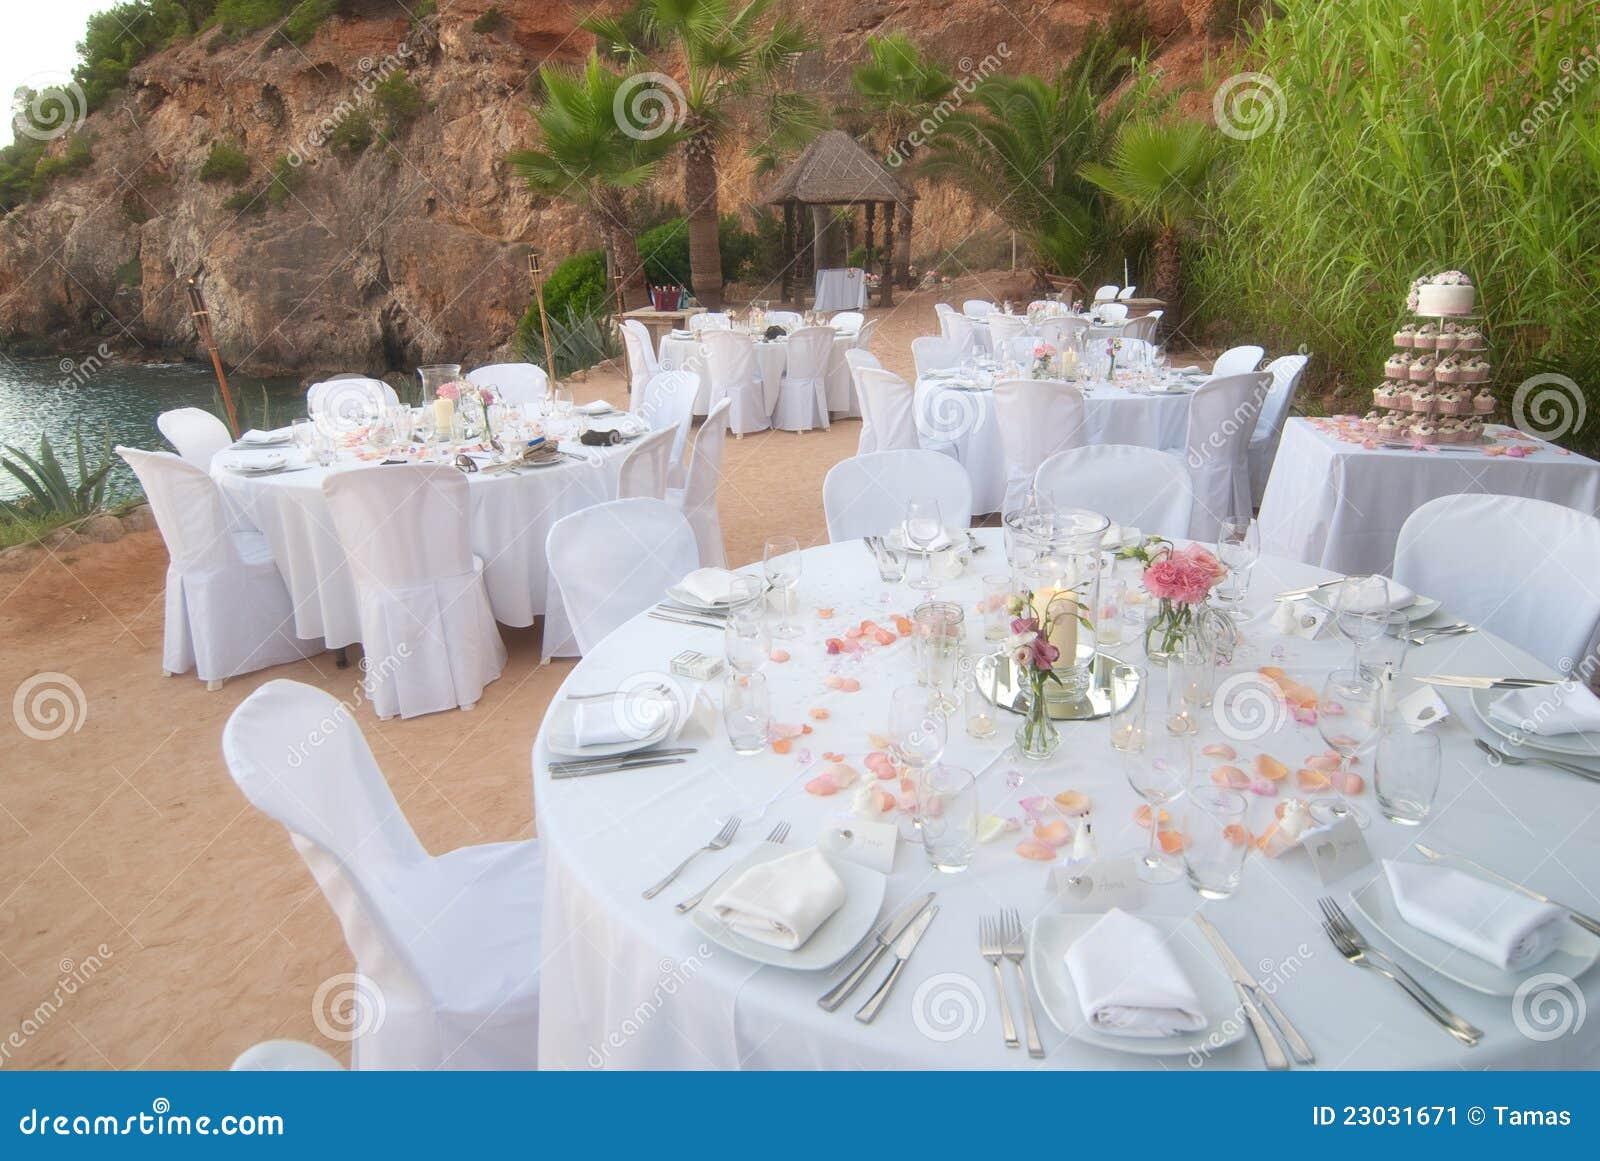 banquet de mariage de bord de la mer image stock image 23031671. Black Bedroom Furniture Sets. Home Design Ideas